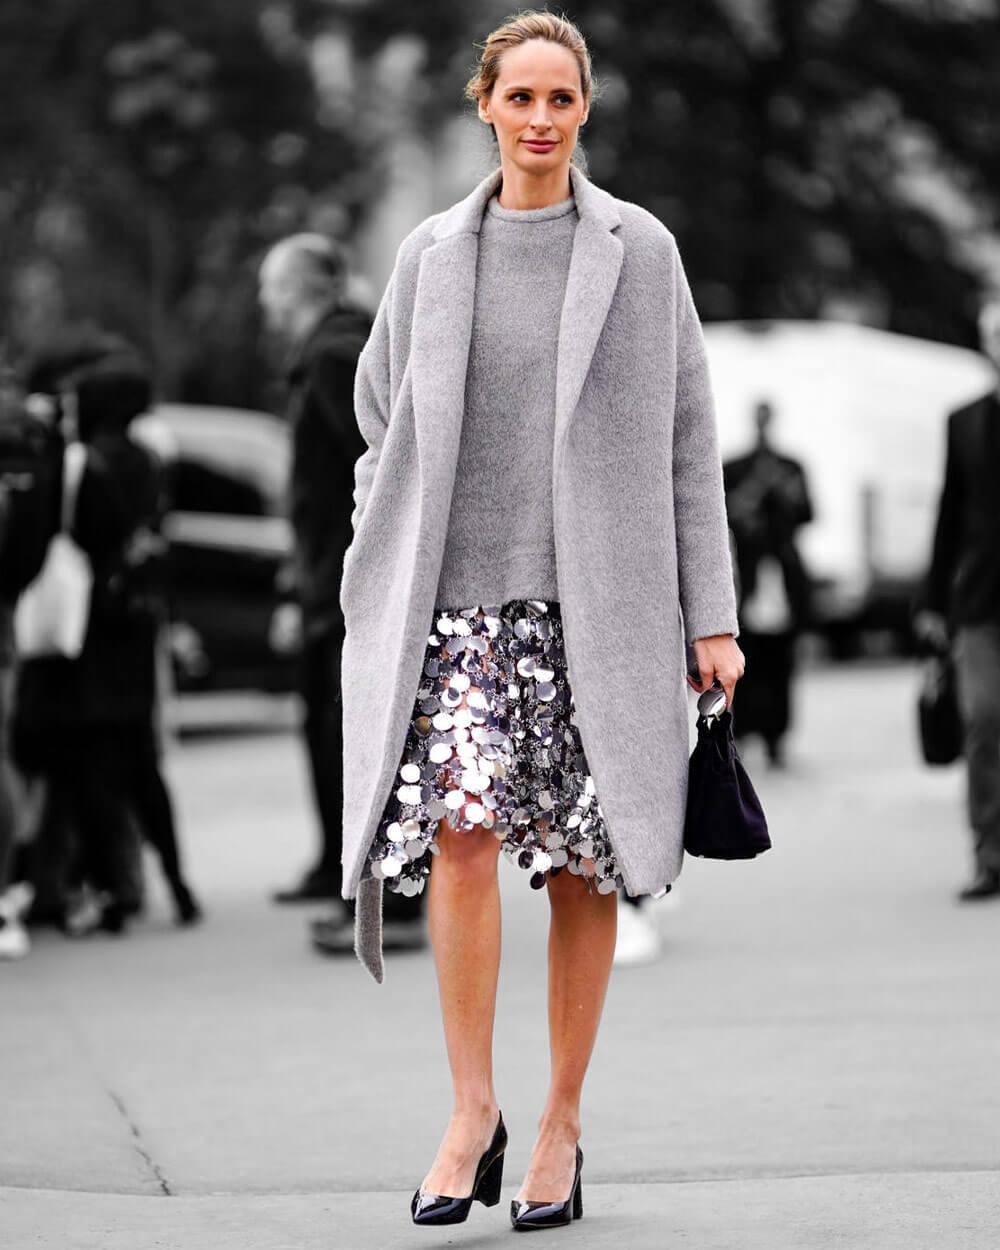 disco dress fashion trends 2021